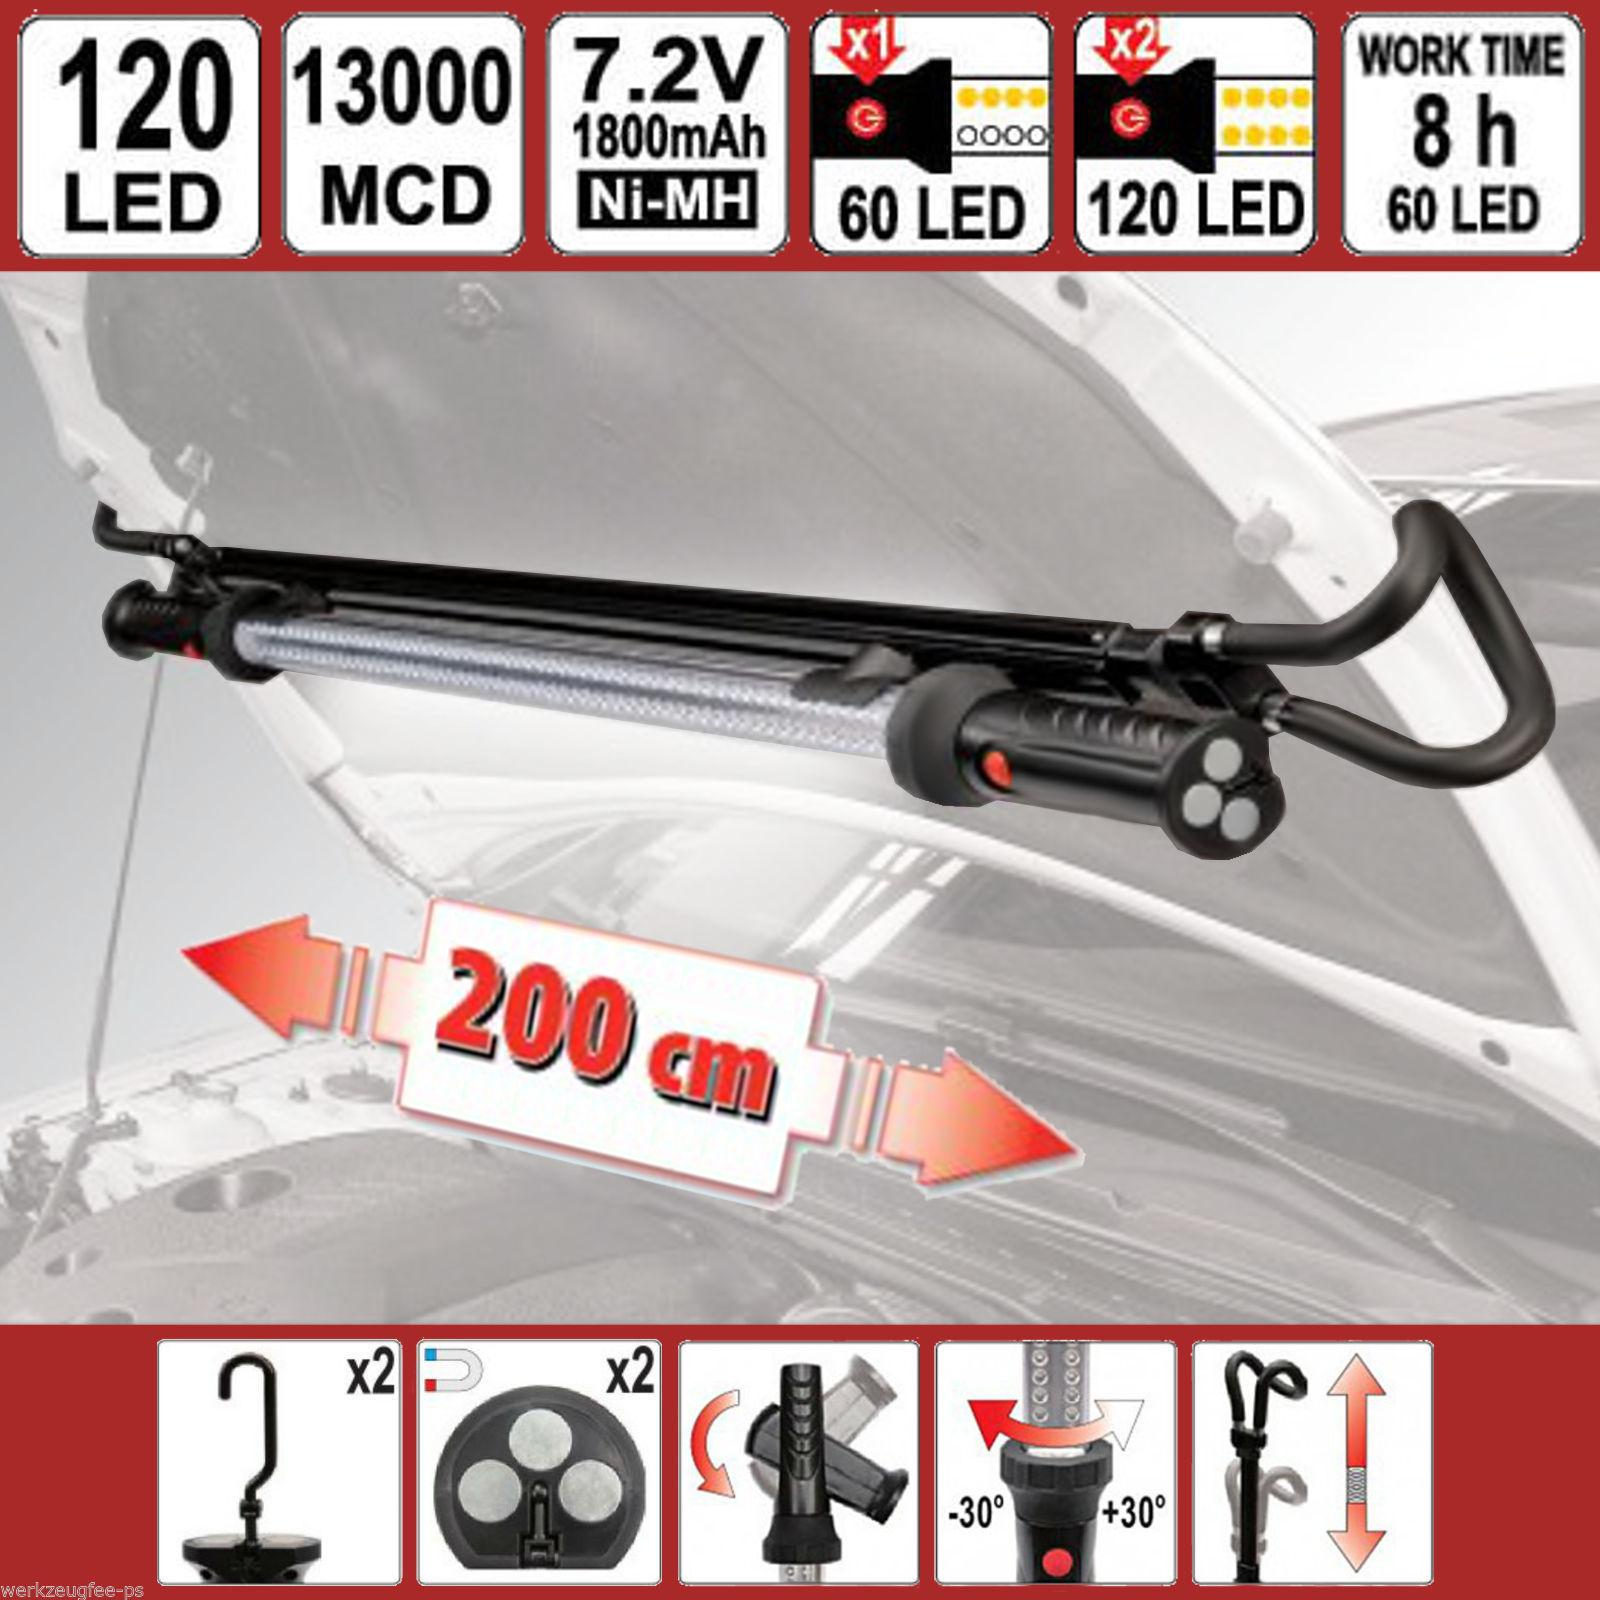 60/120 LED Akku Motorraum-Arbeits-Leuchte Motorhauben-Lampe Werkstatt Stablampe